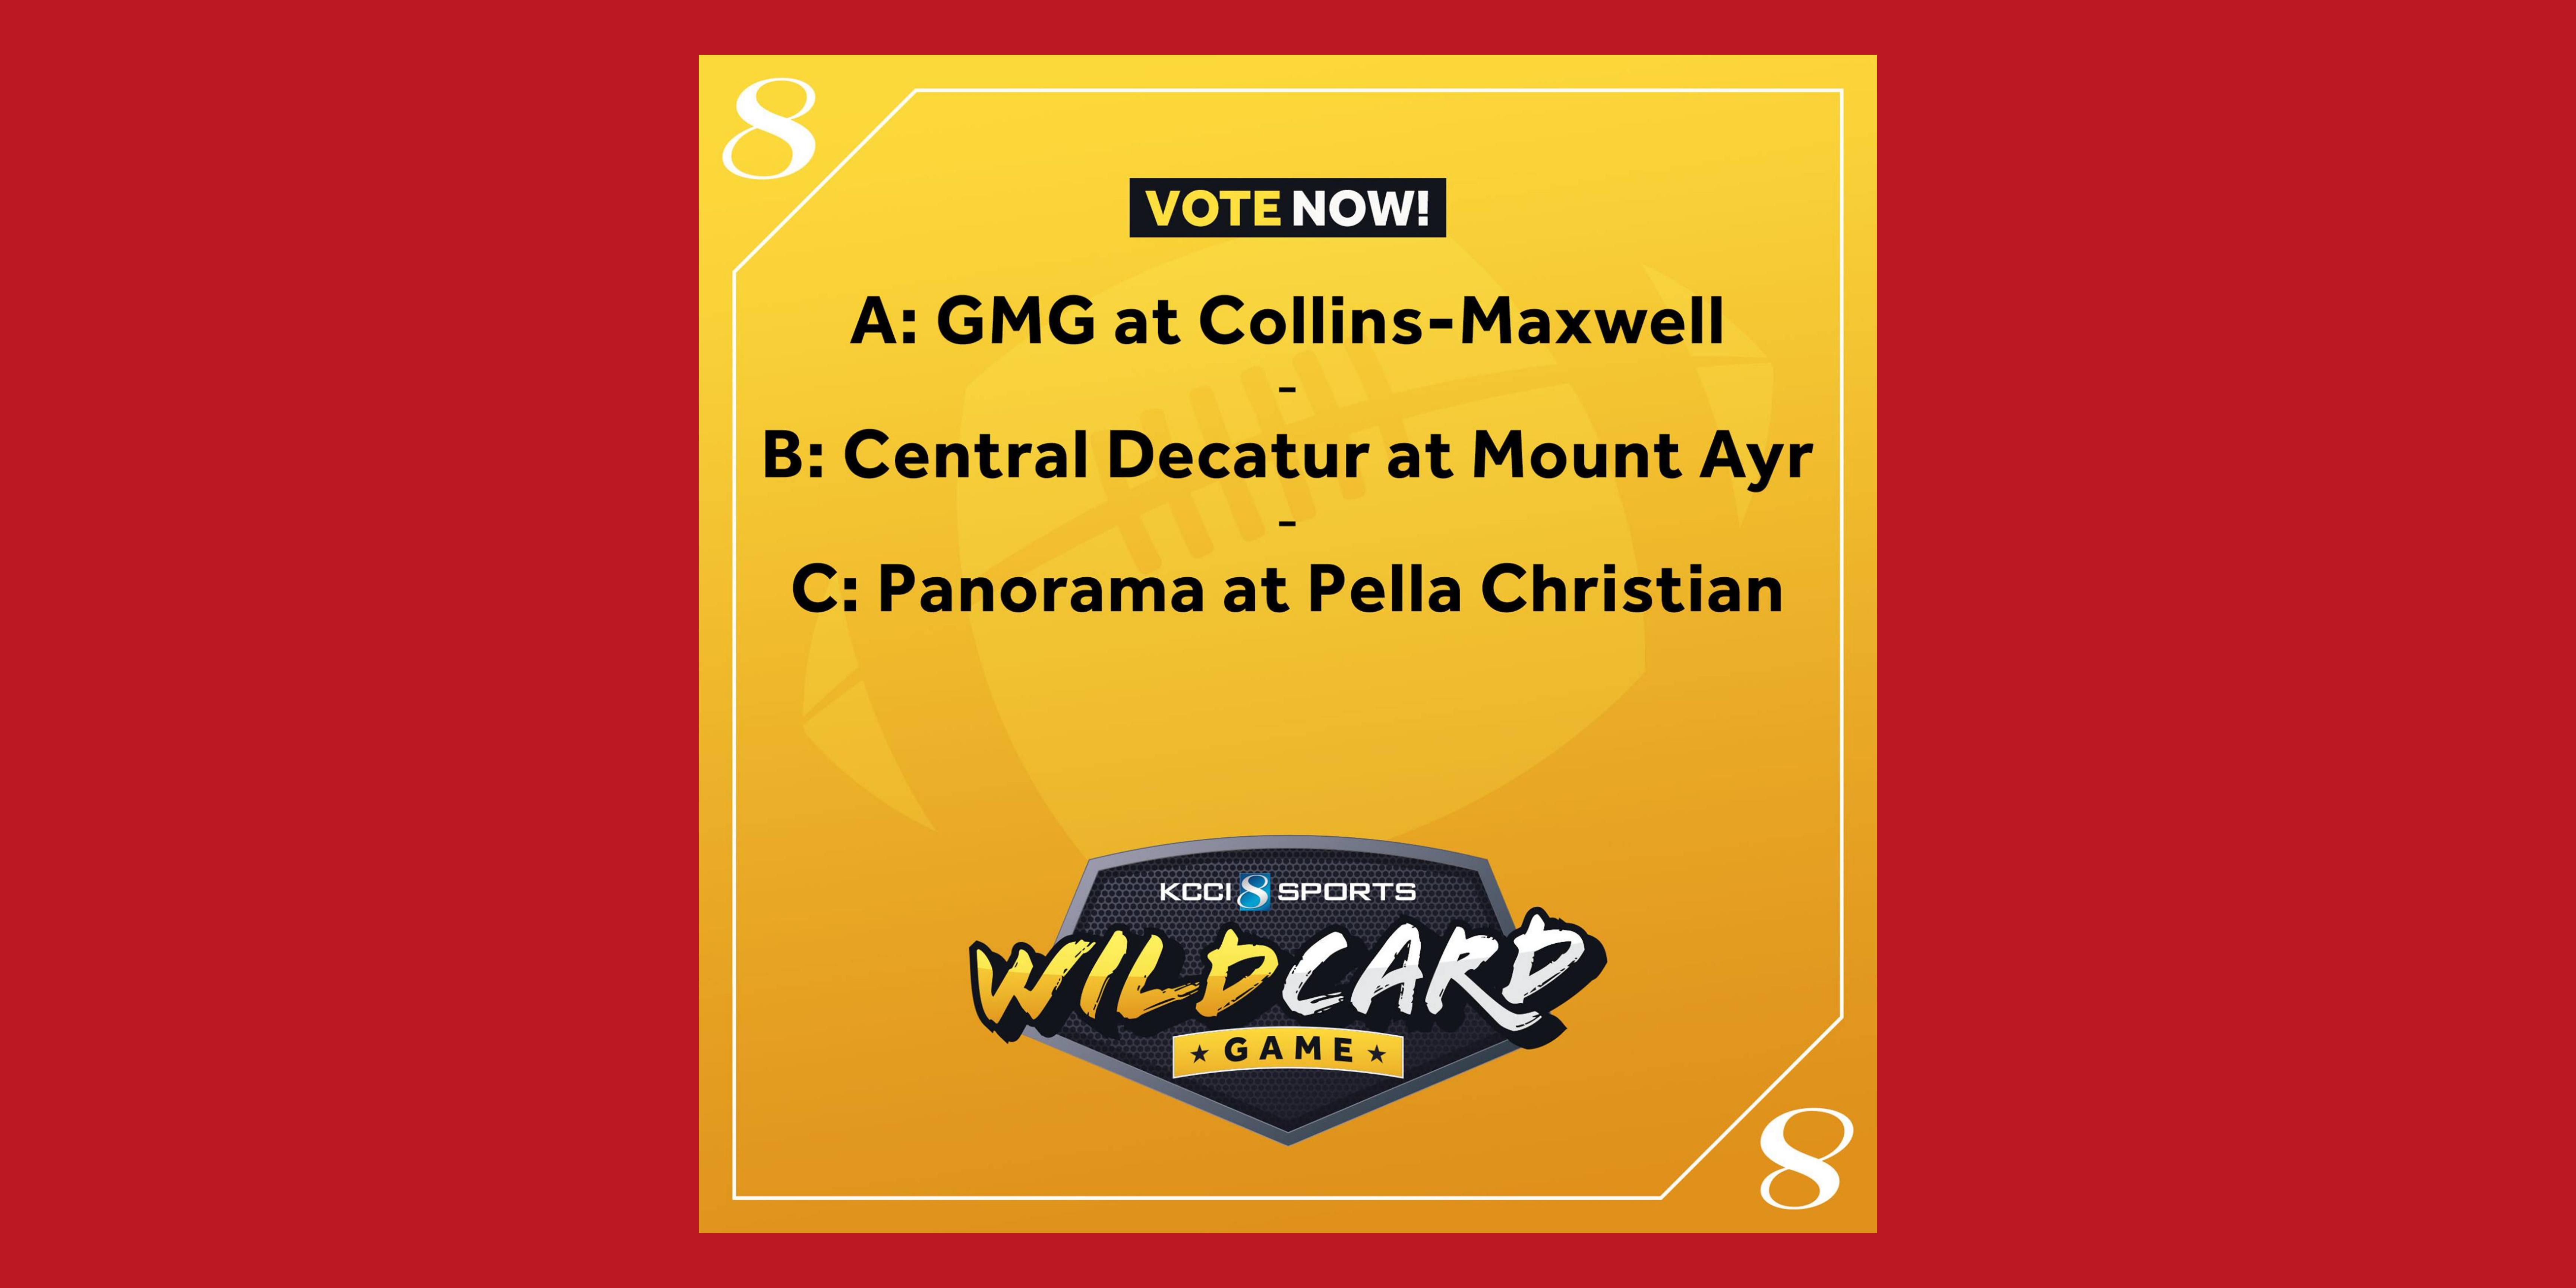 Kcci wild card game week 2 cd v mt ayr (1)